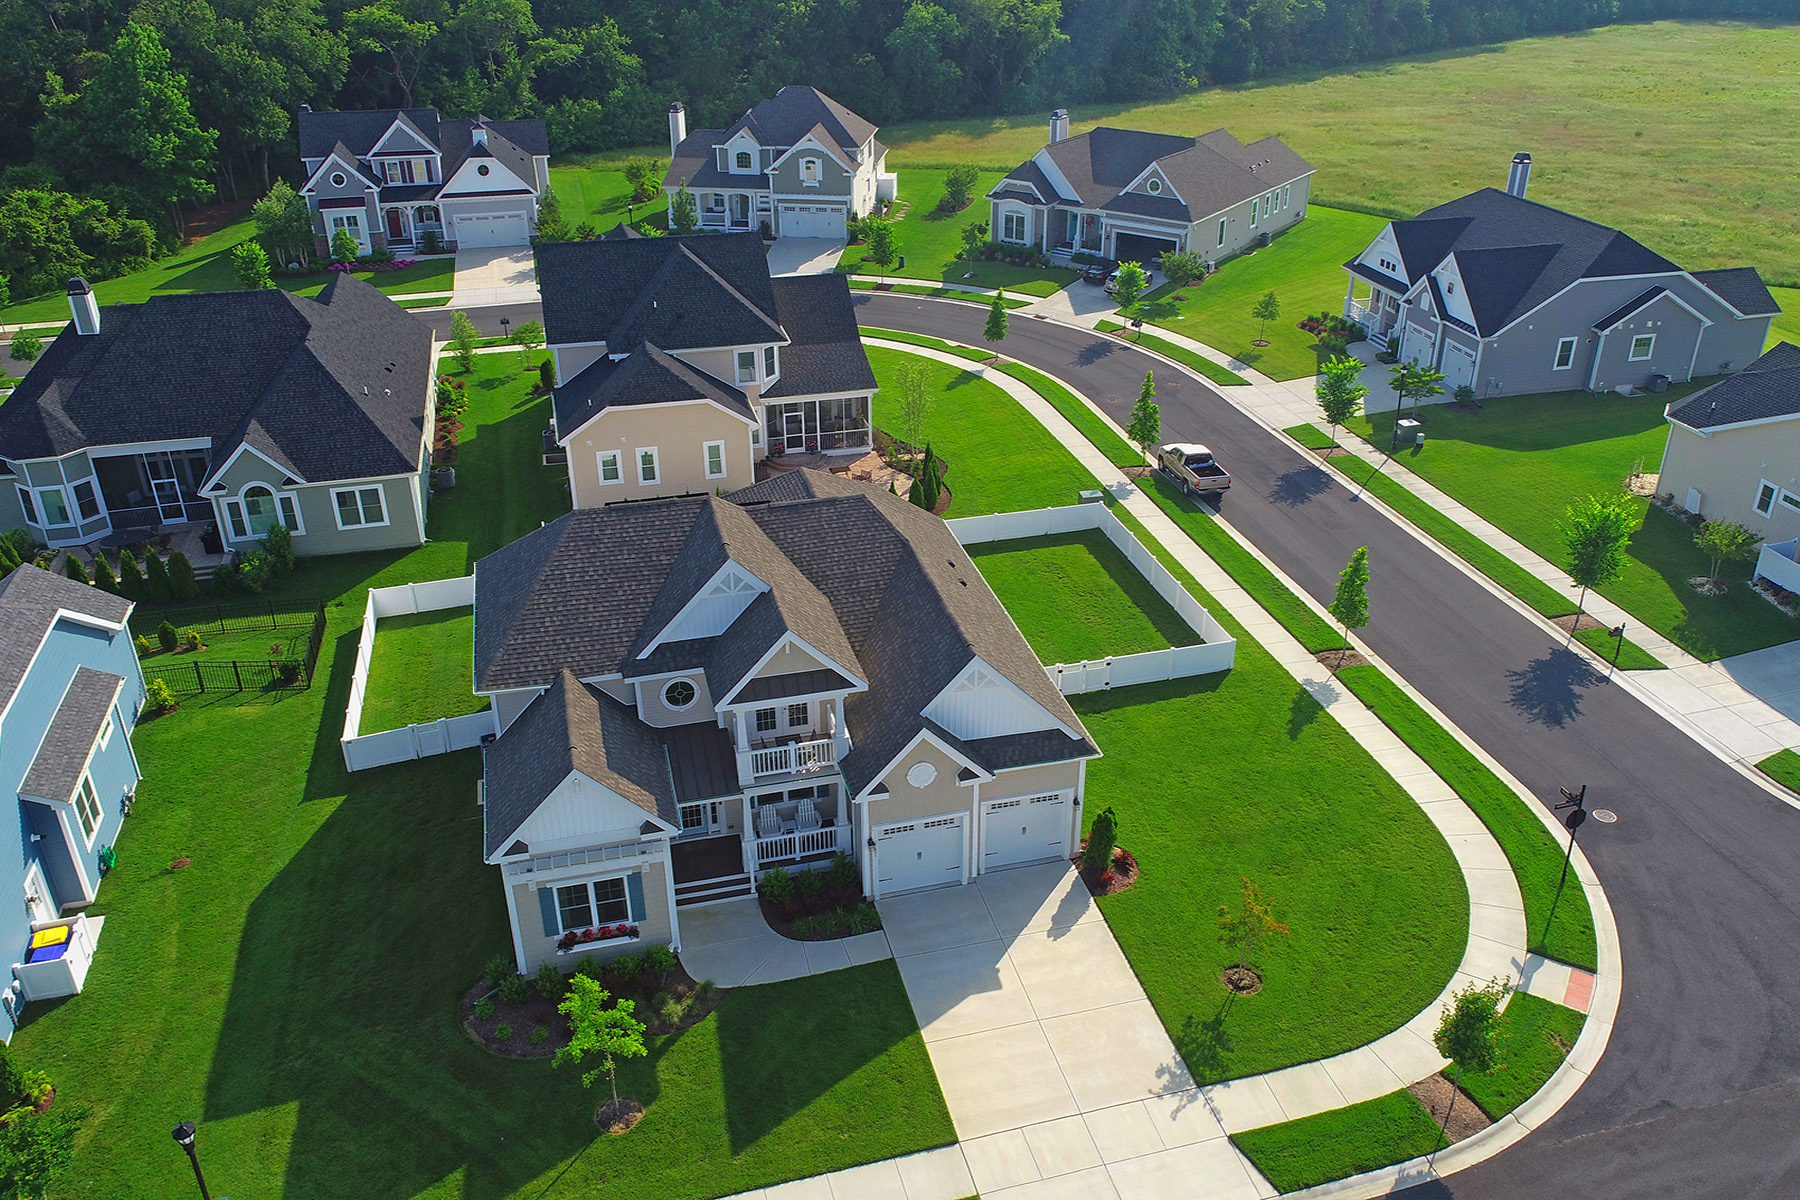 Enfamiljshus för Försäljning vid 17601 Venables Dr , Lewes, DE 19958 17601 Venables Dr, Lewes, Delaware 19958 Usa